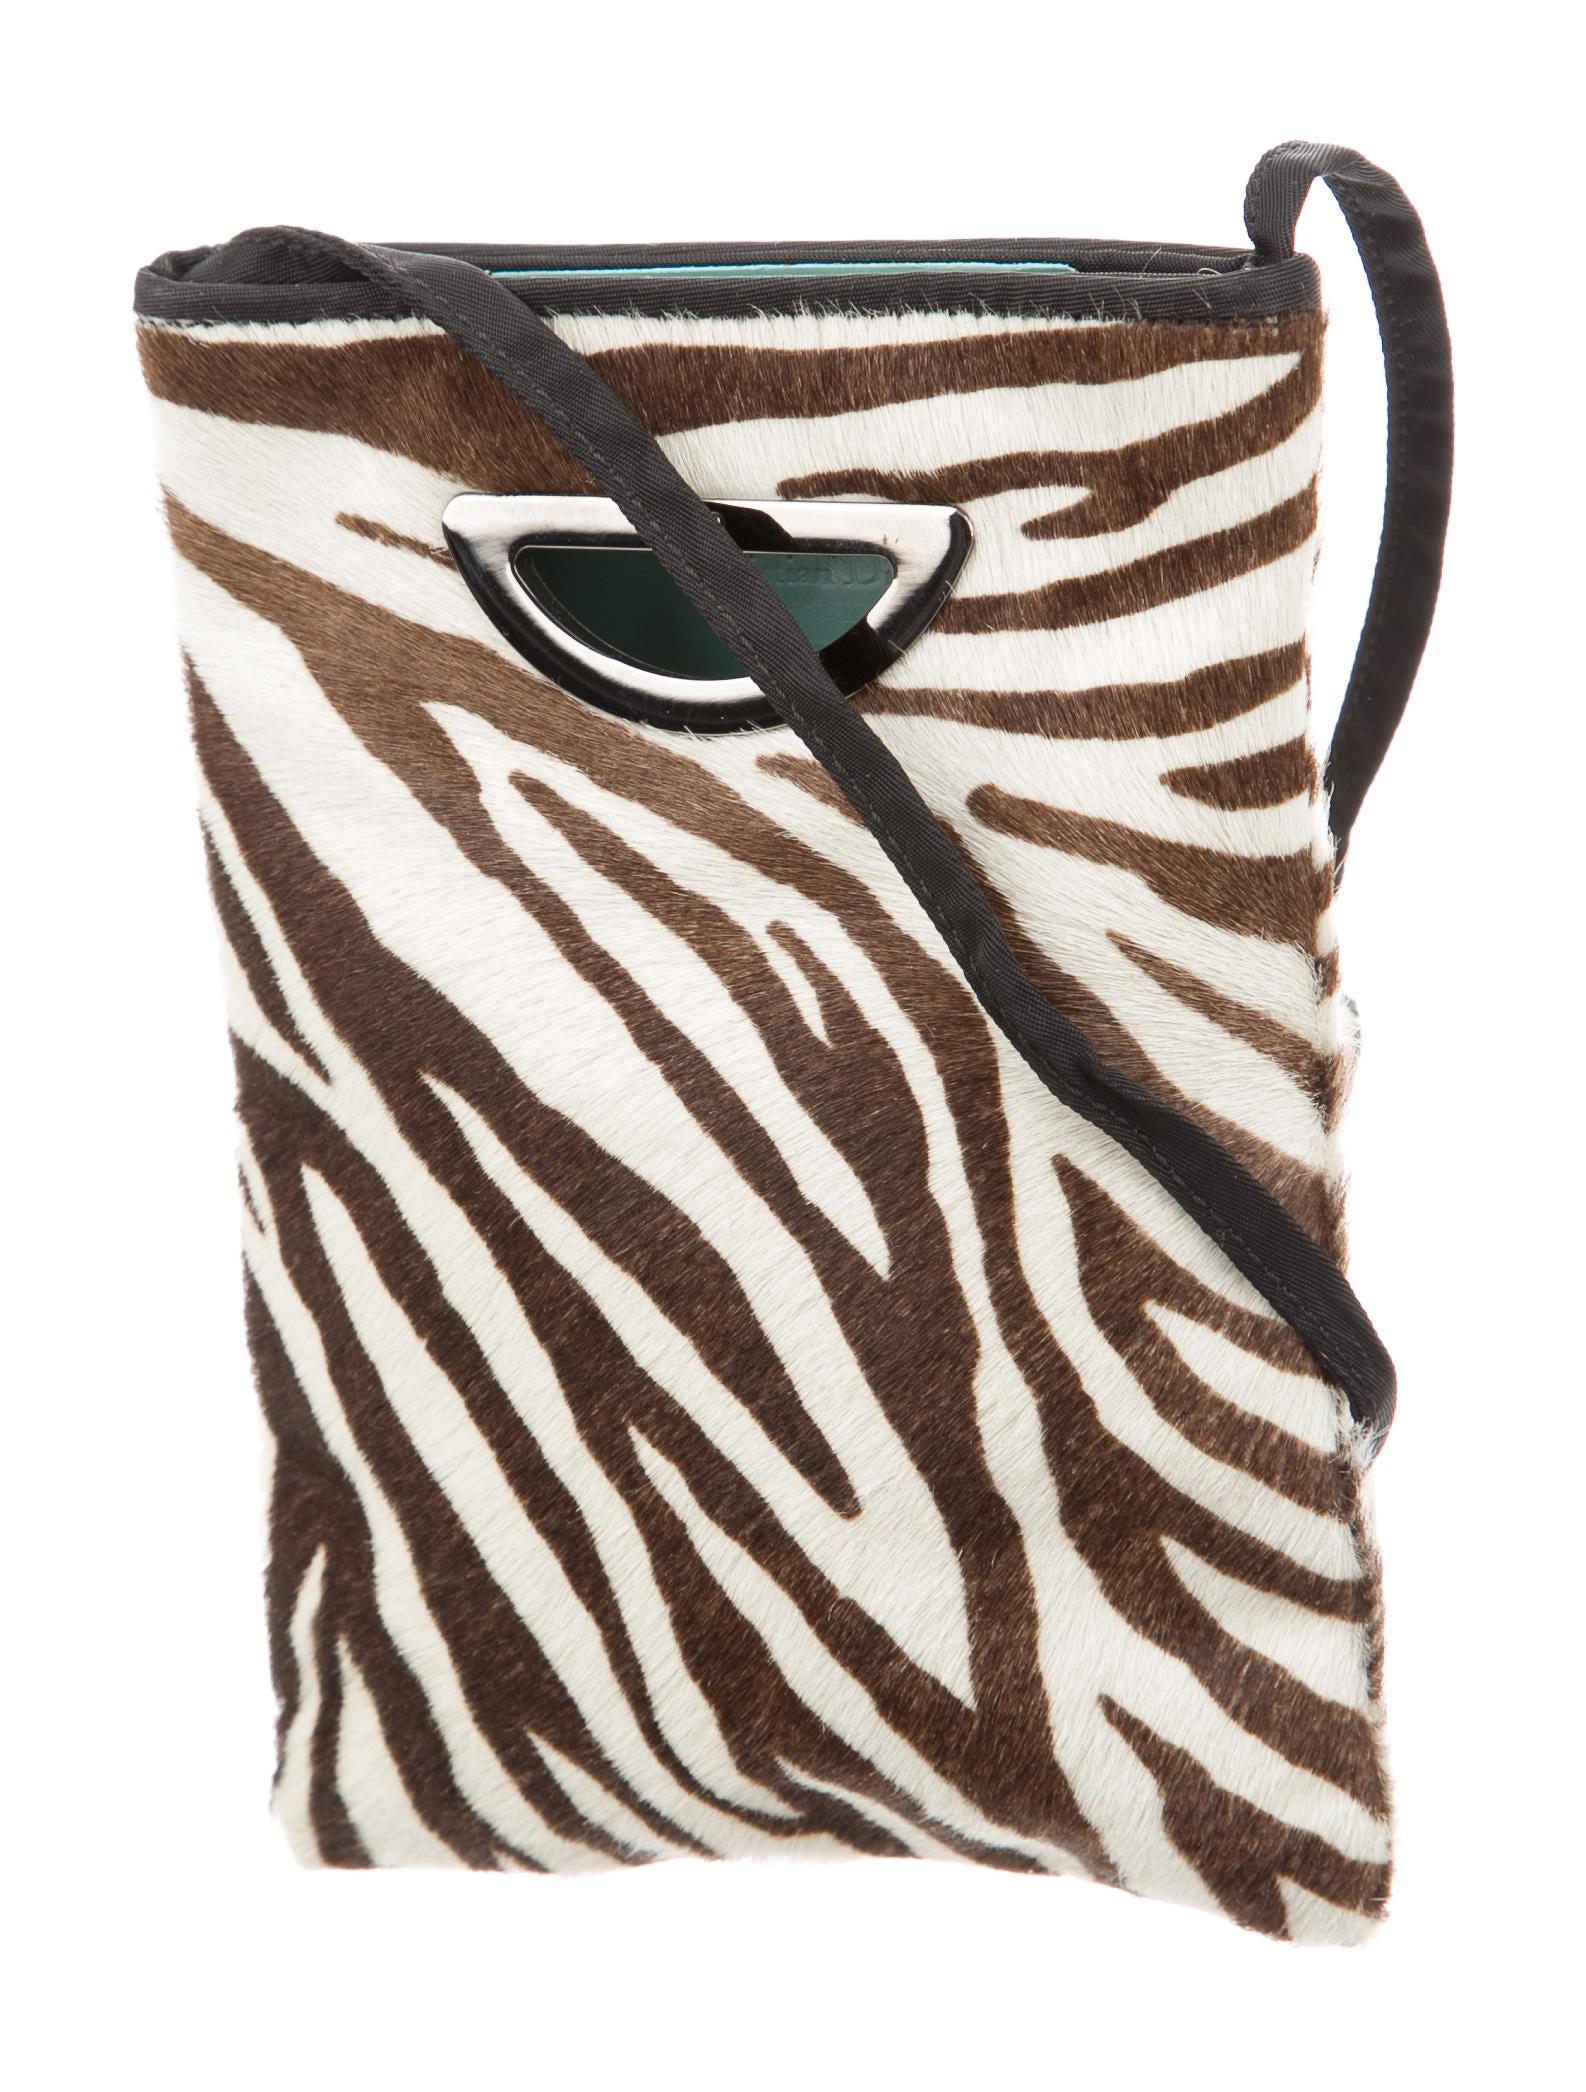 Christian Dior Mini Ponyhair Shoulder Bag Handbags